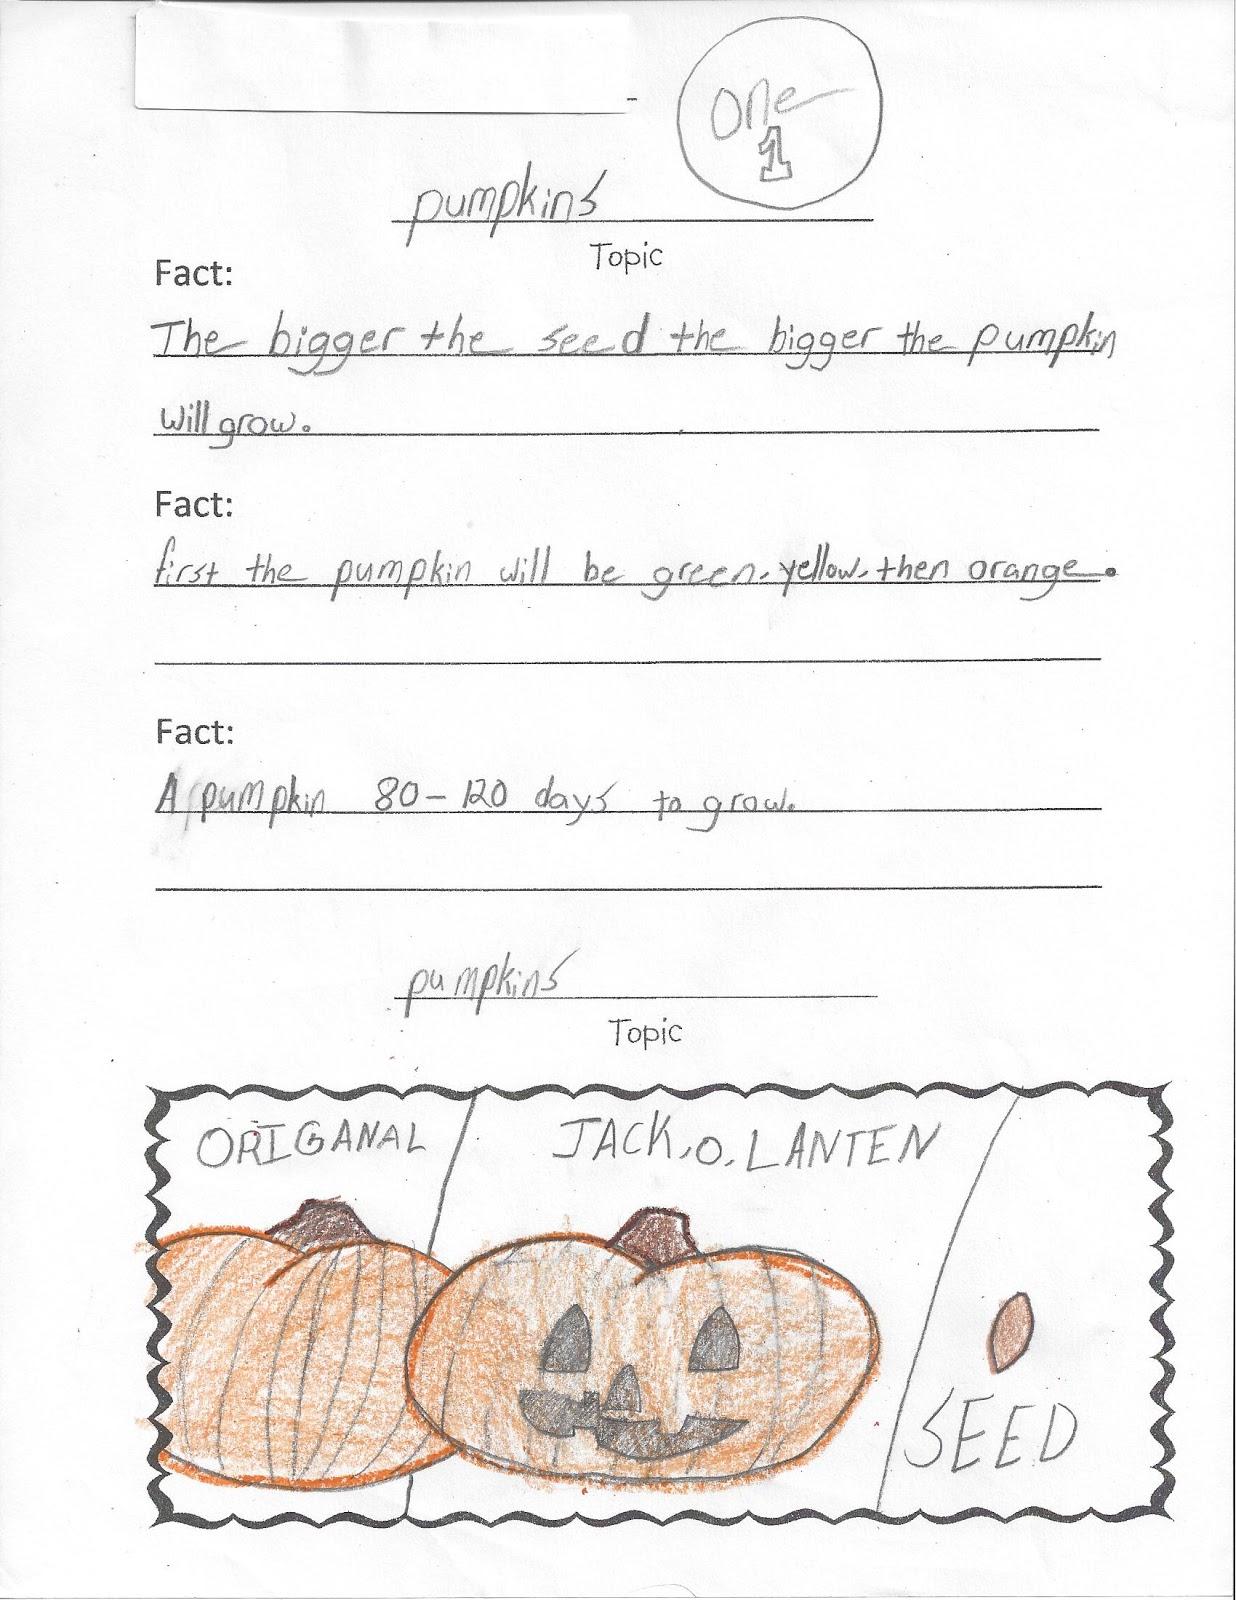 parts of a pumpkin diagram hinduism vs buddhism venn totally terrific in texas pumpkins pumkins